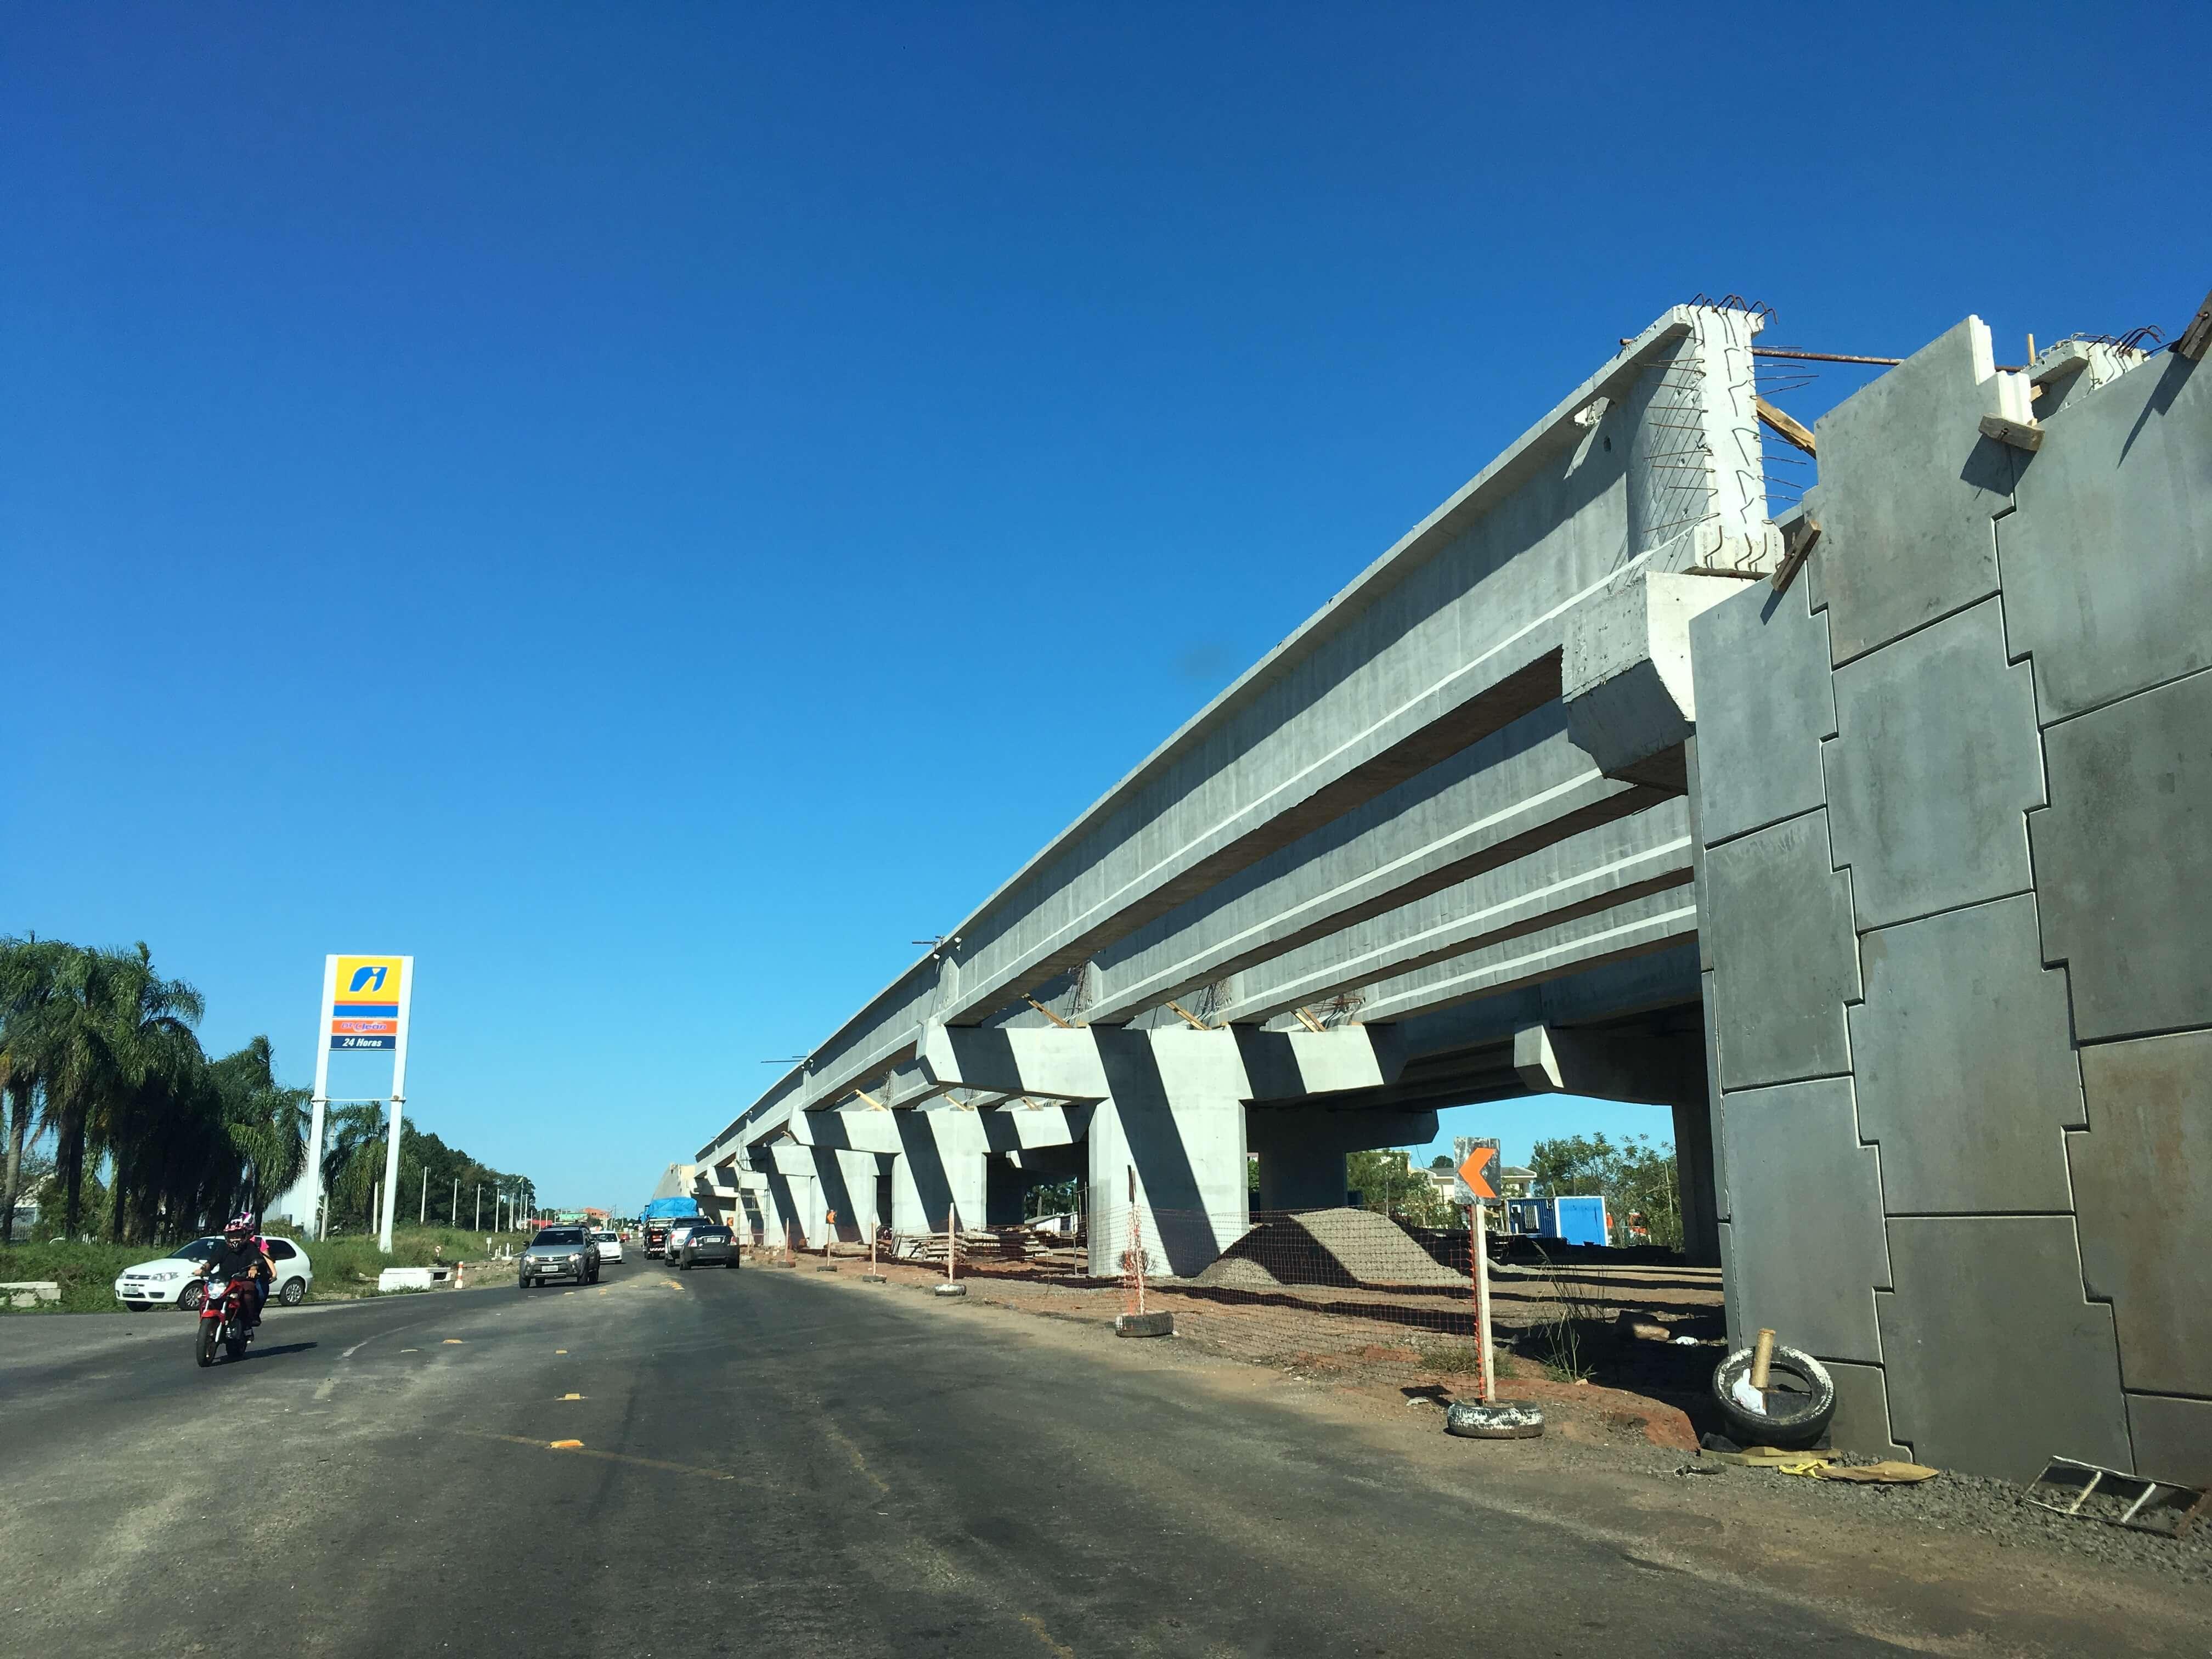 BR 158 - Tancredo Neves - Vigas